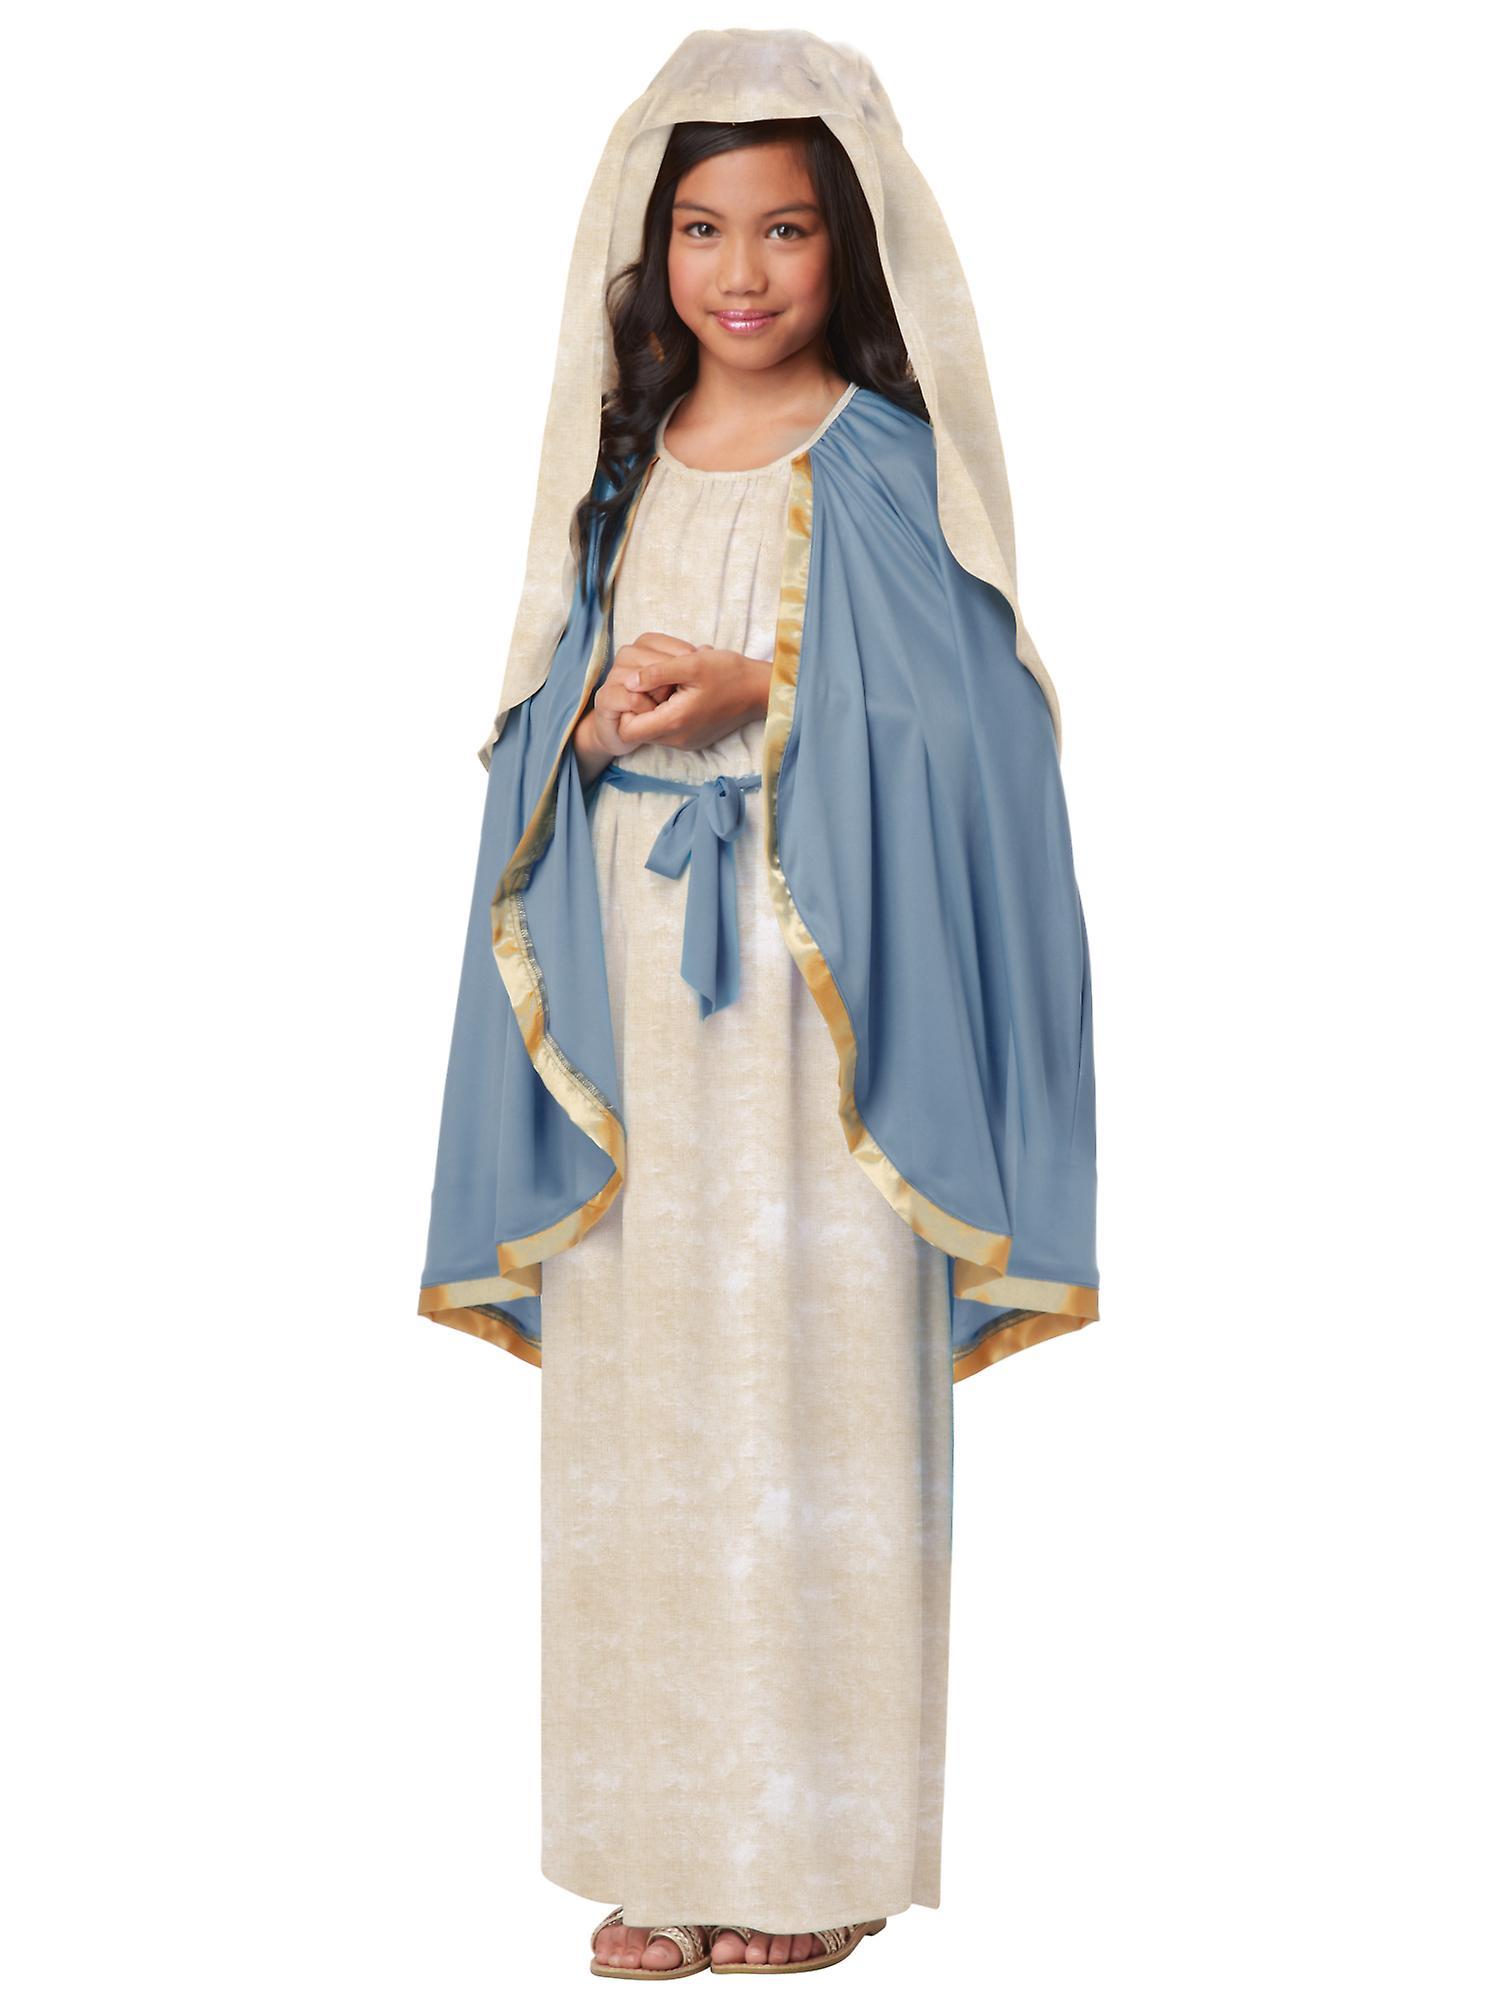 The Virgin Mary Christmas Easter Good Friday Religious Biblical Girls Costume